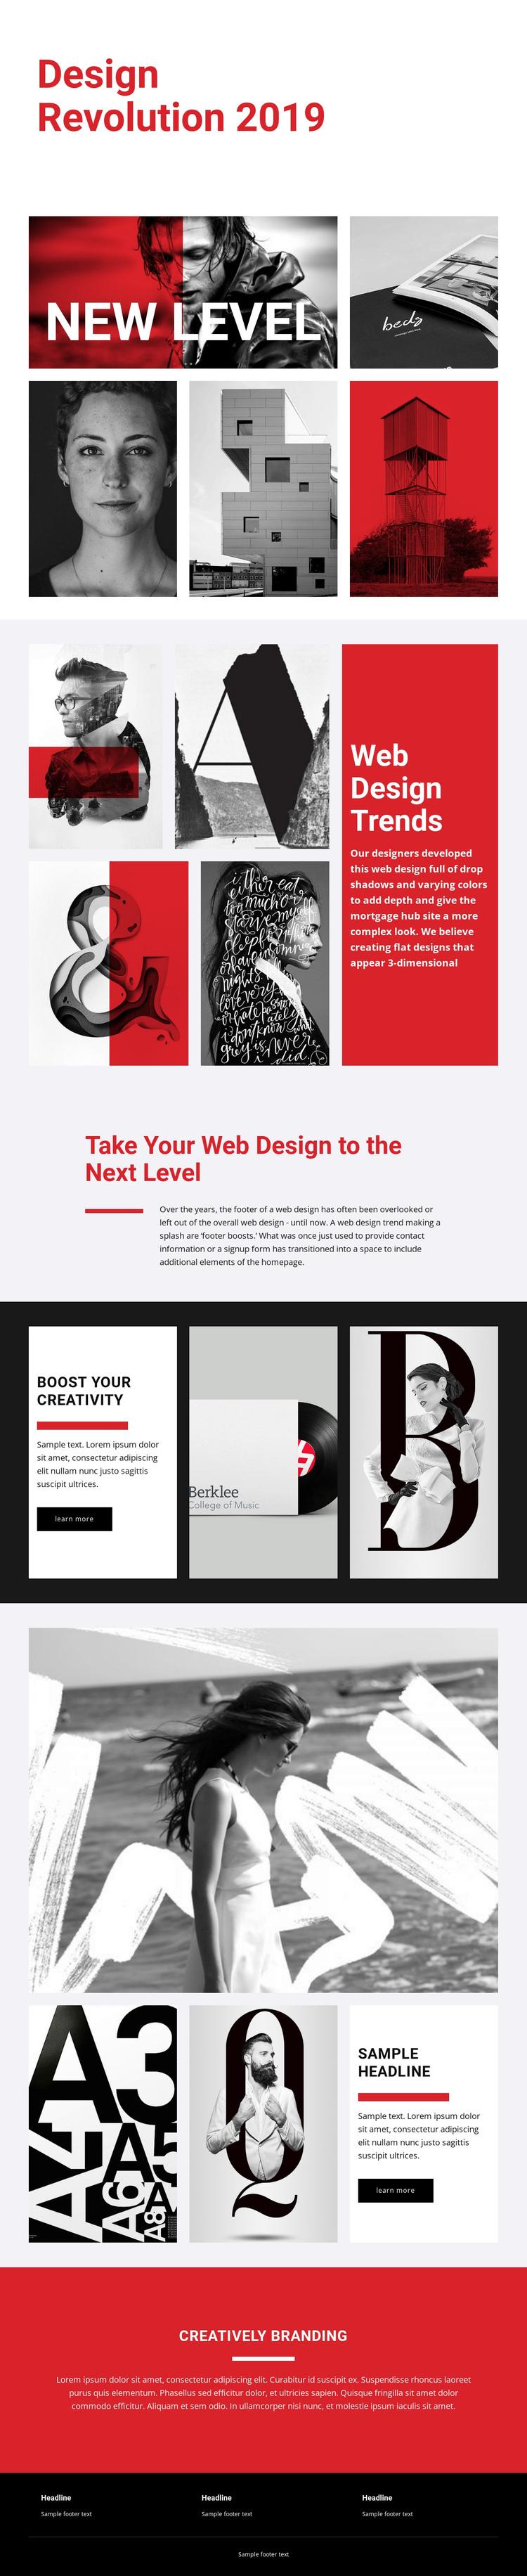 Revolution of designing art Website Builder Software